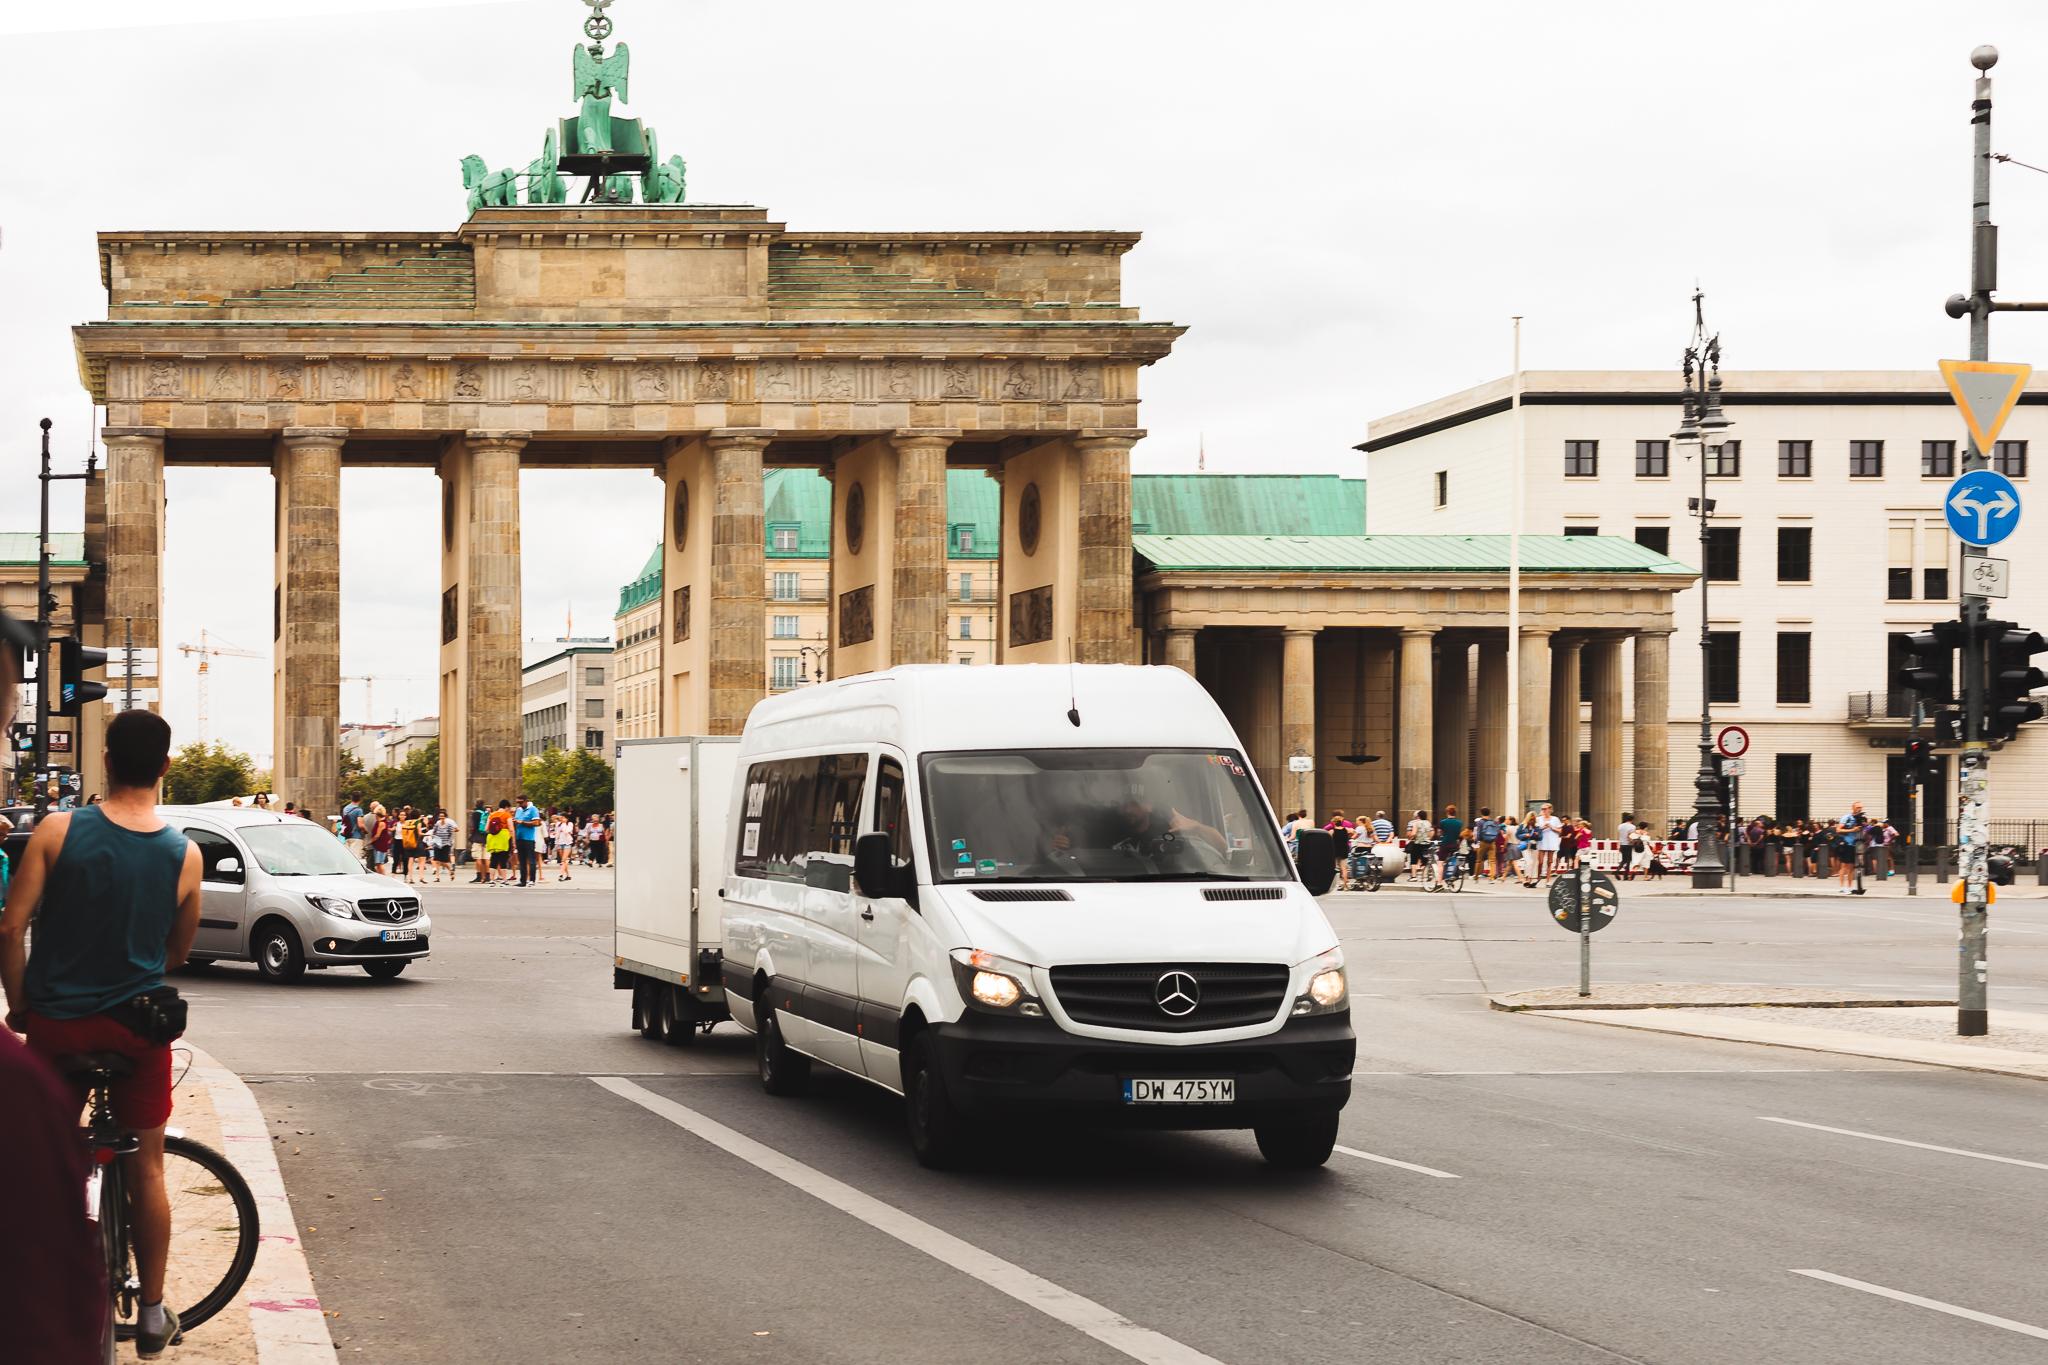 Bison in Berlin